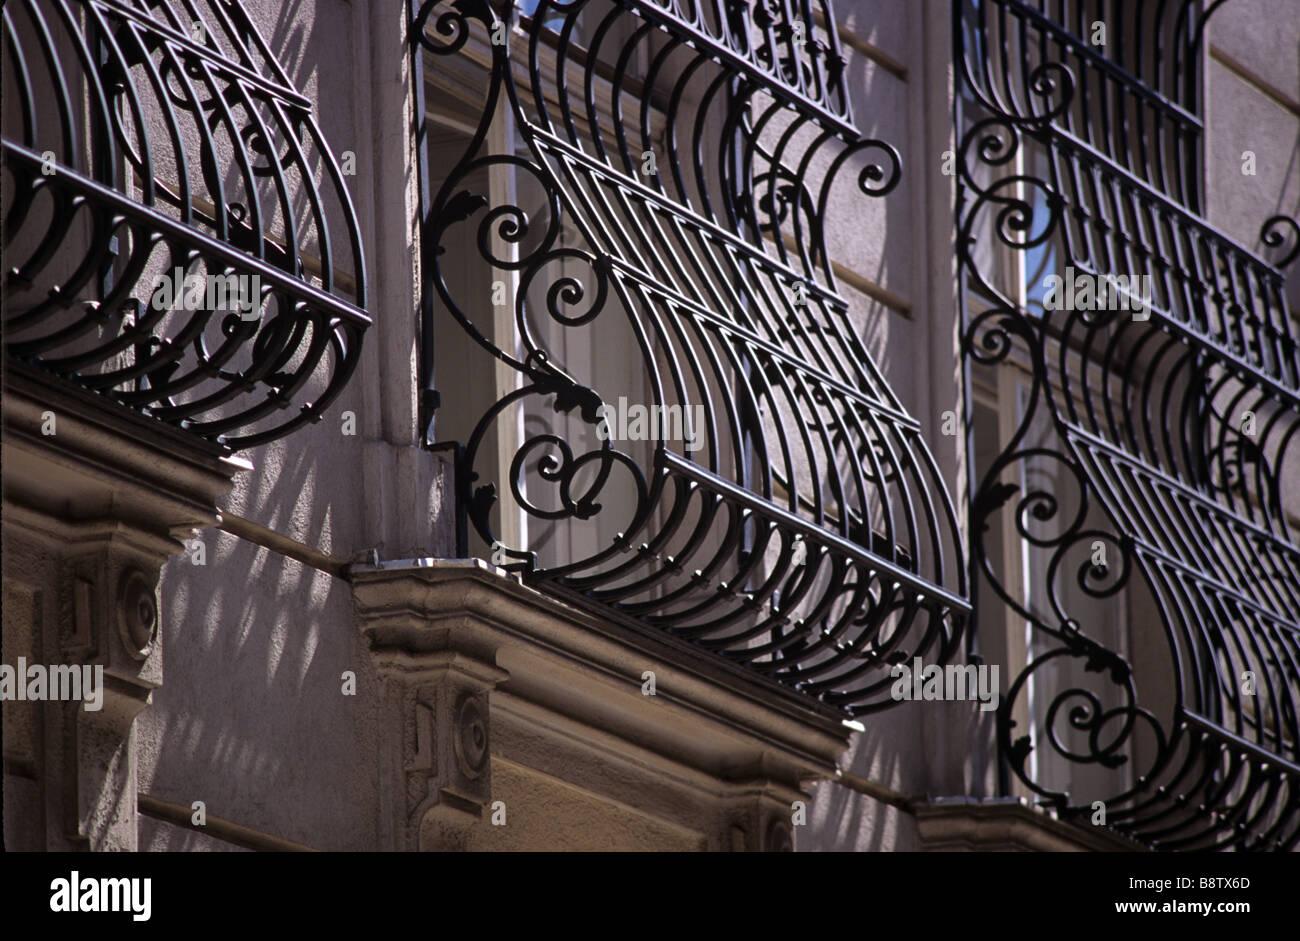 Ornate Scroll Design Wrought Iron Window Grills, Vienna